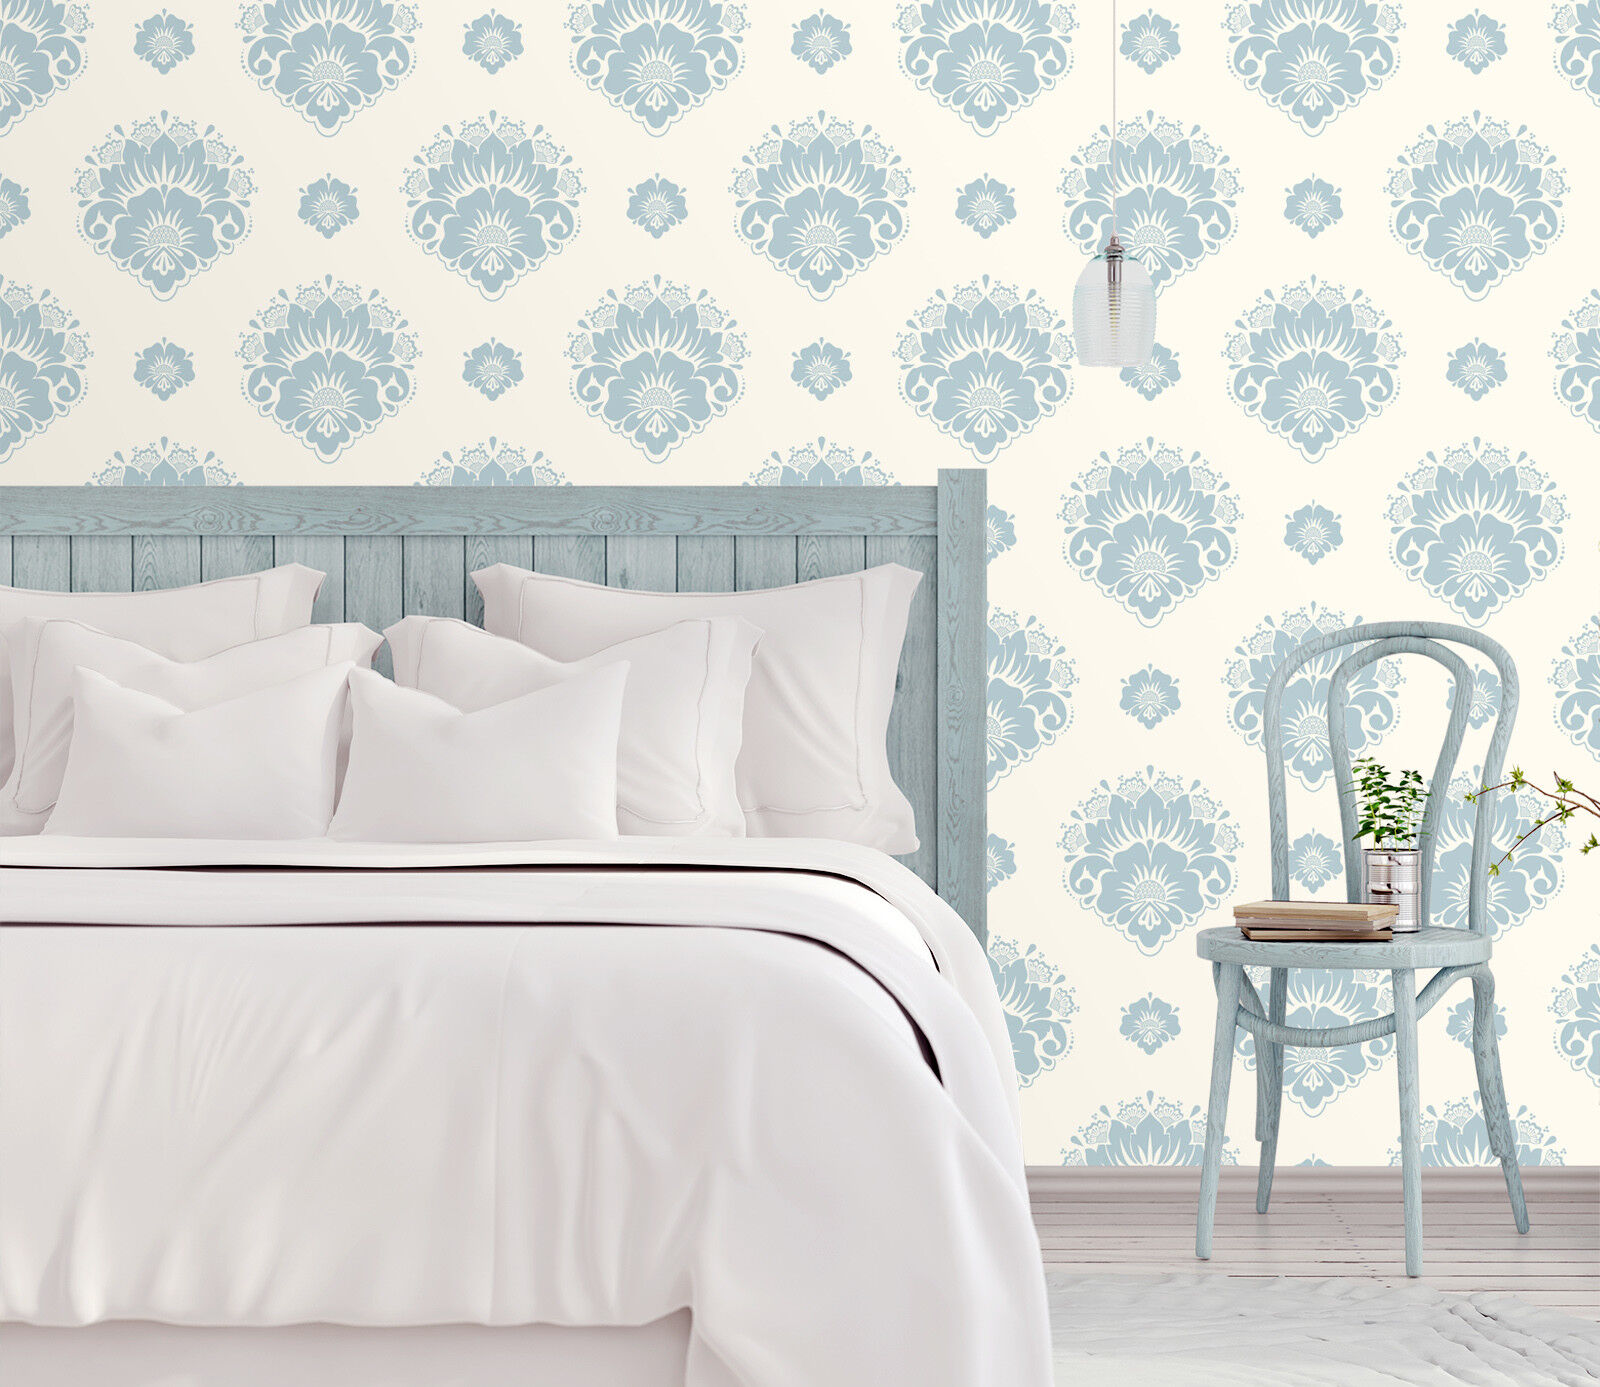 3D Blau Floral Art 255 Wallpaper Mural Print Wall Indoor Wallpaper Murals UK